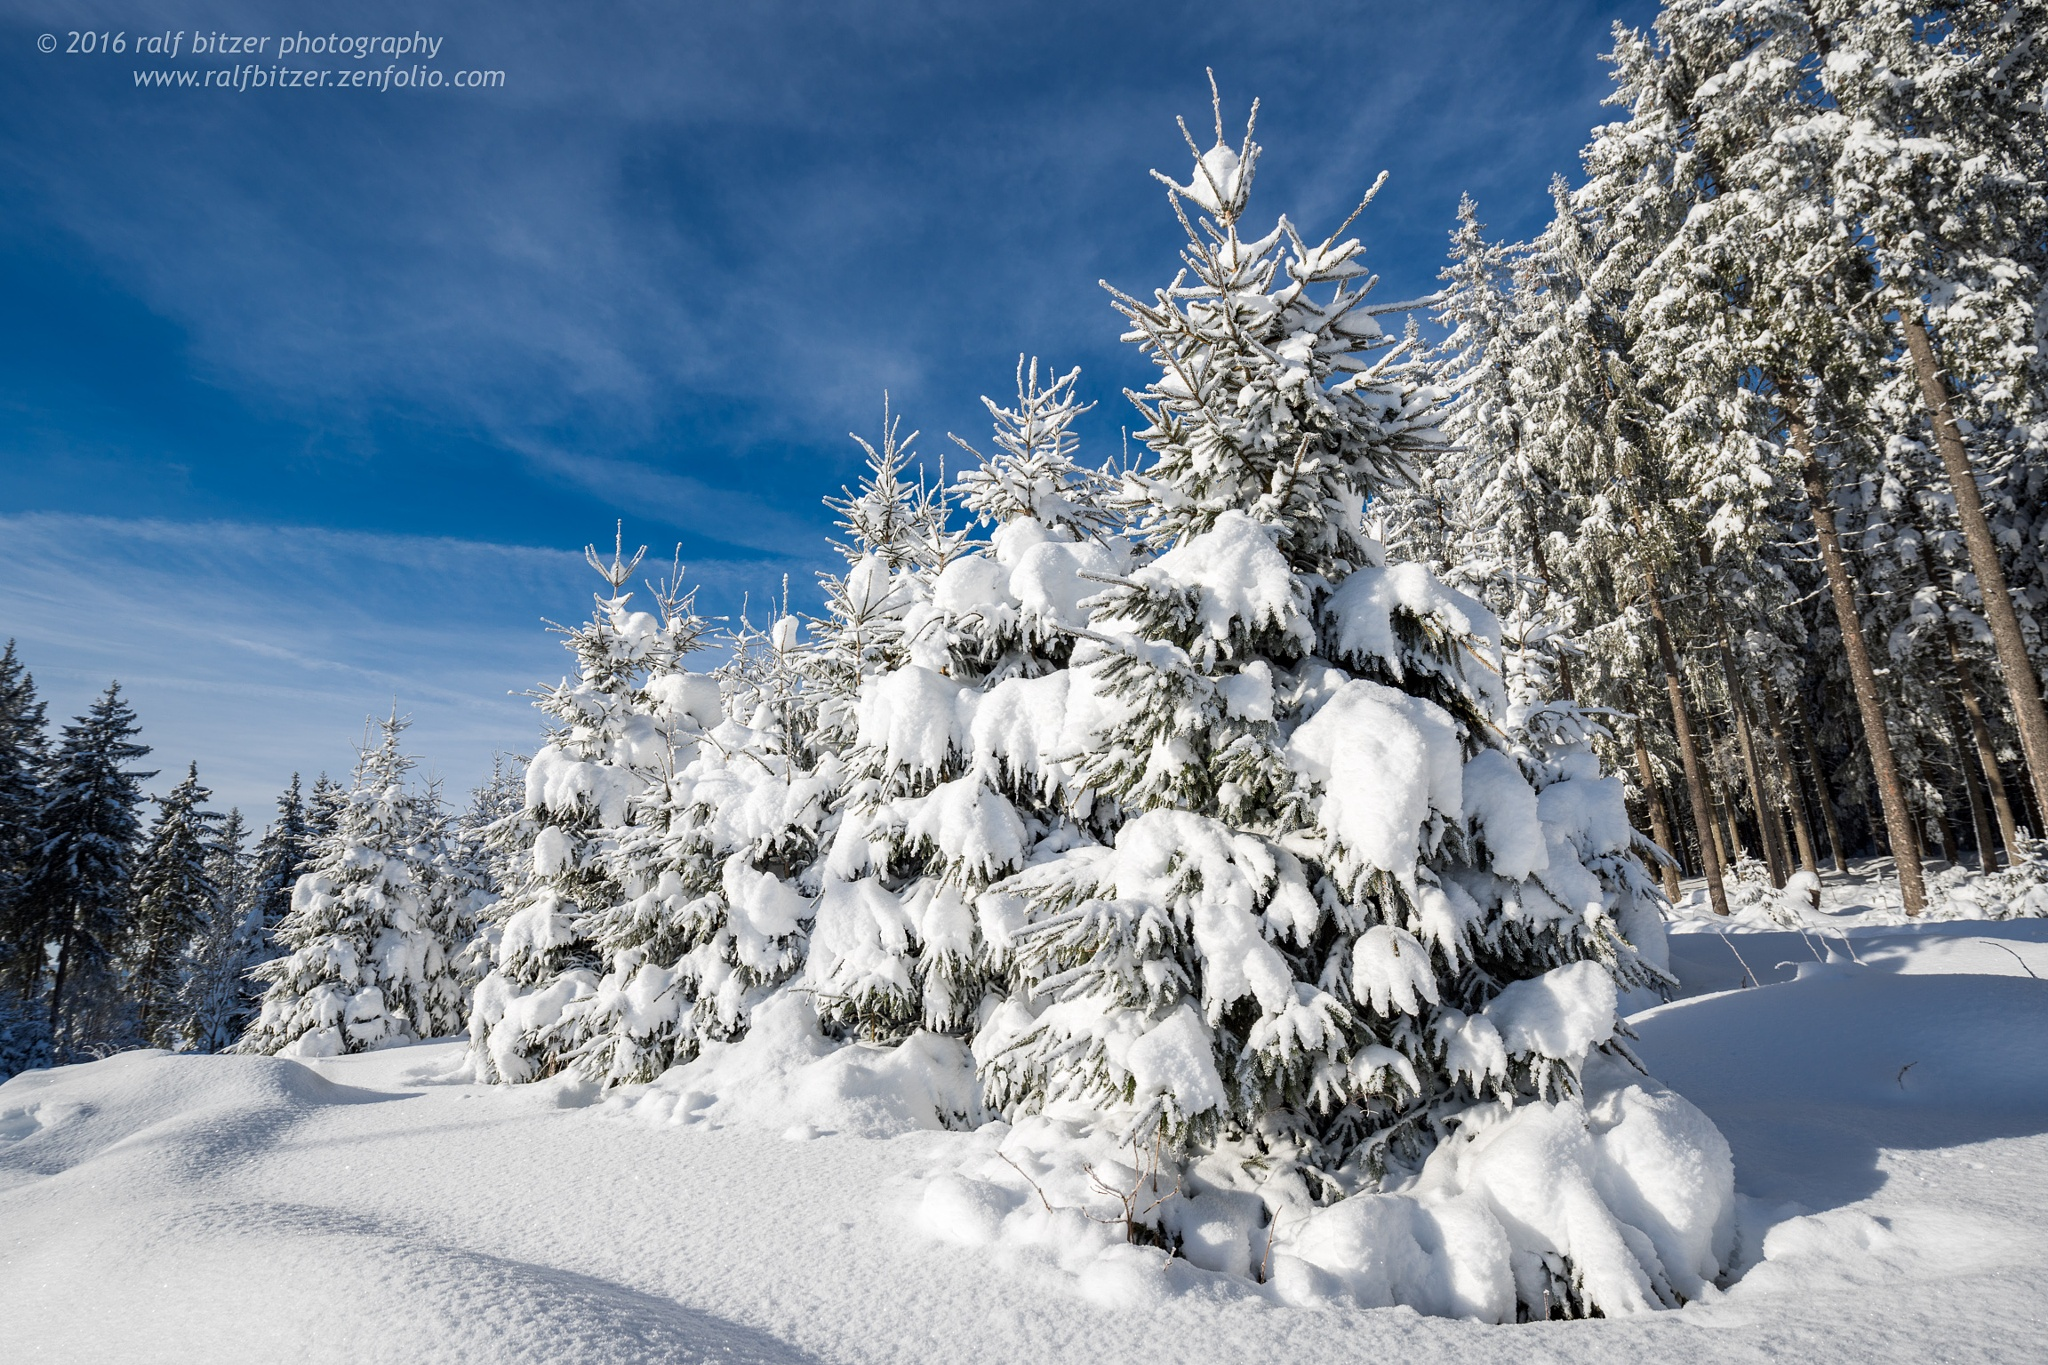 Snow by Ralf Bitzer